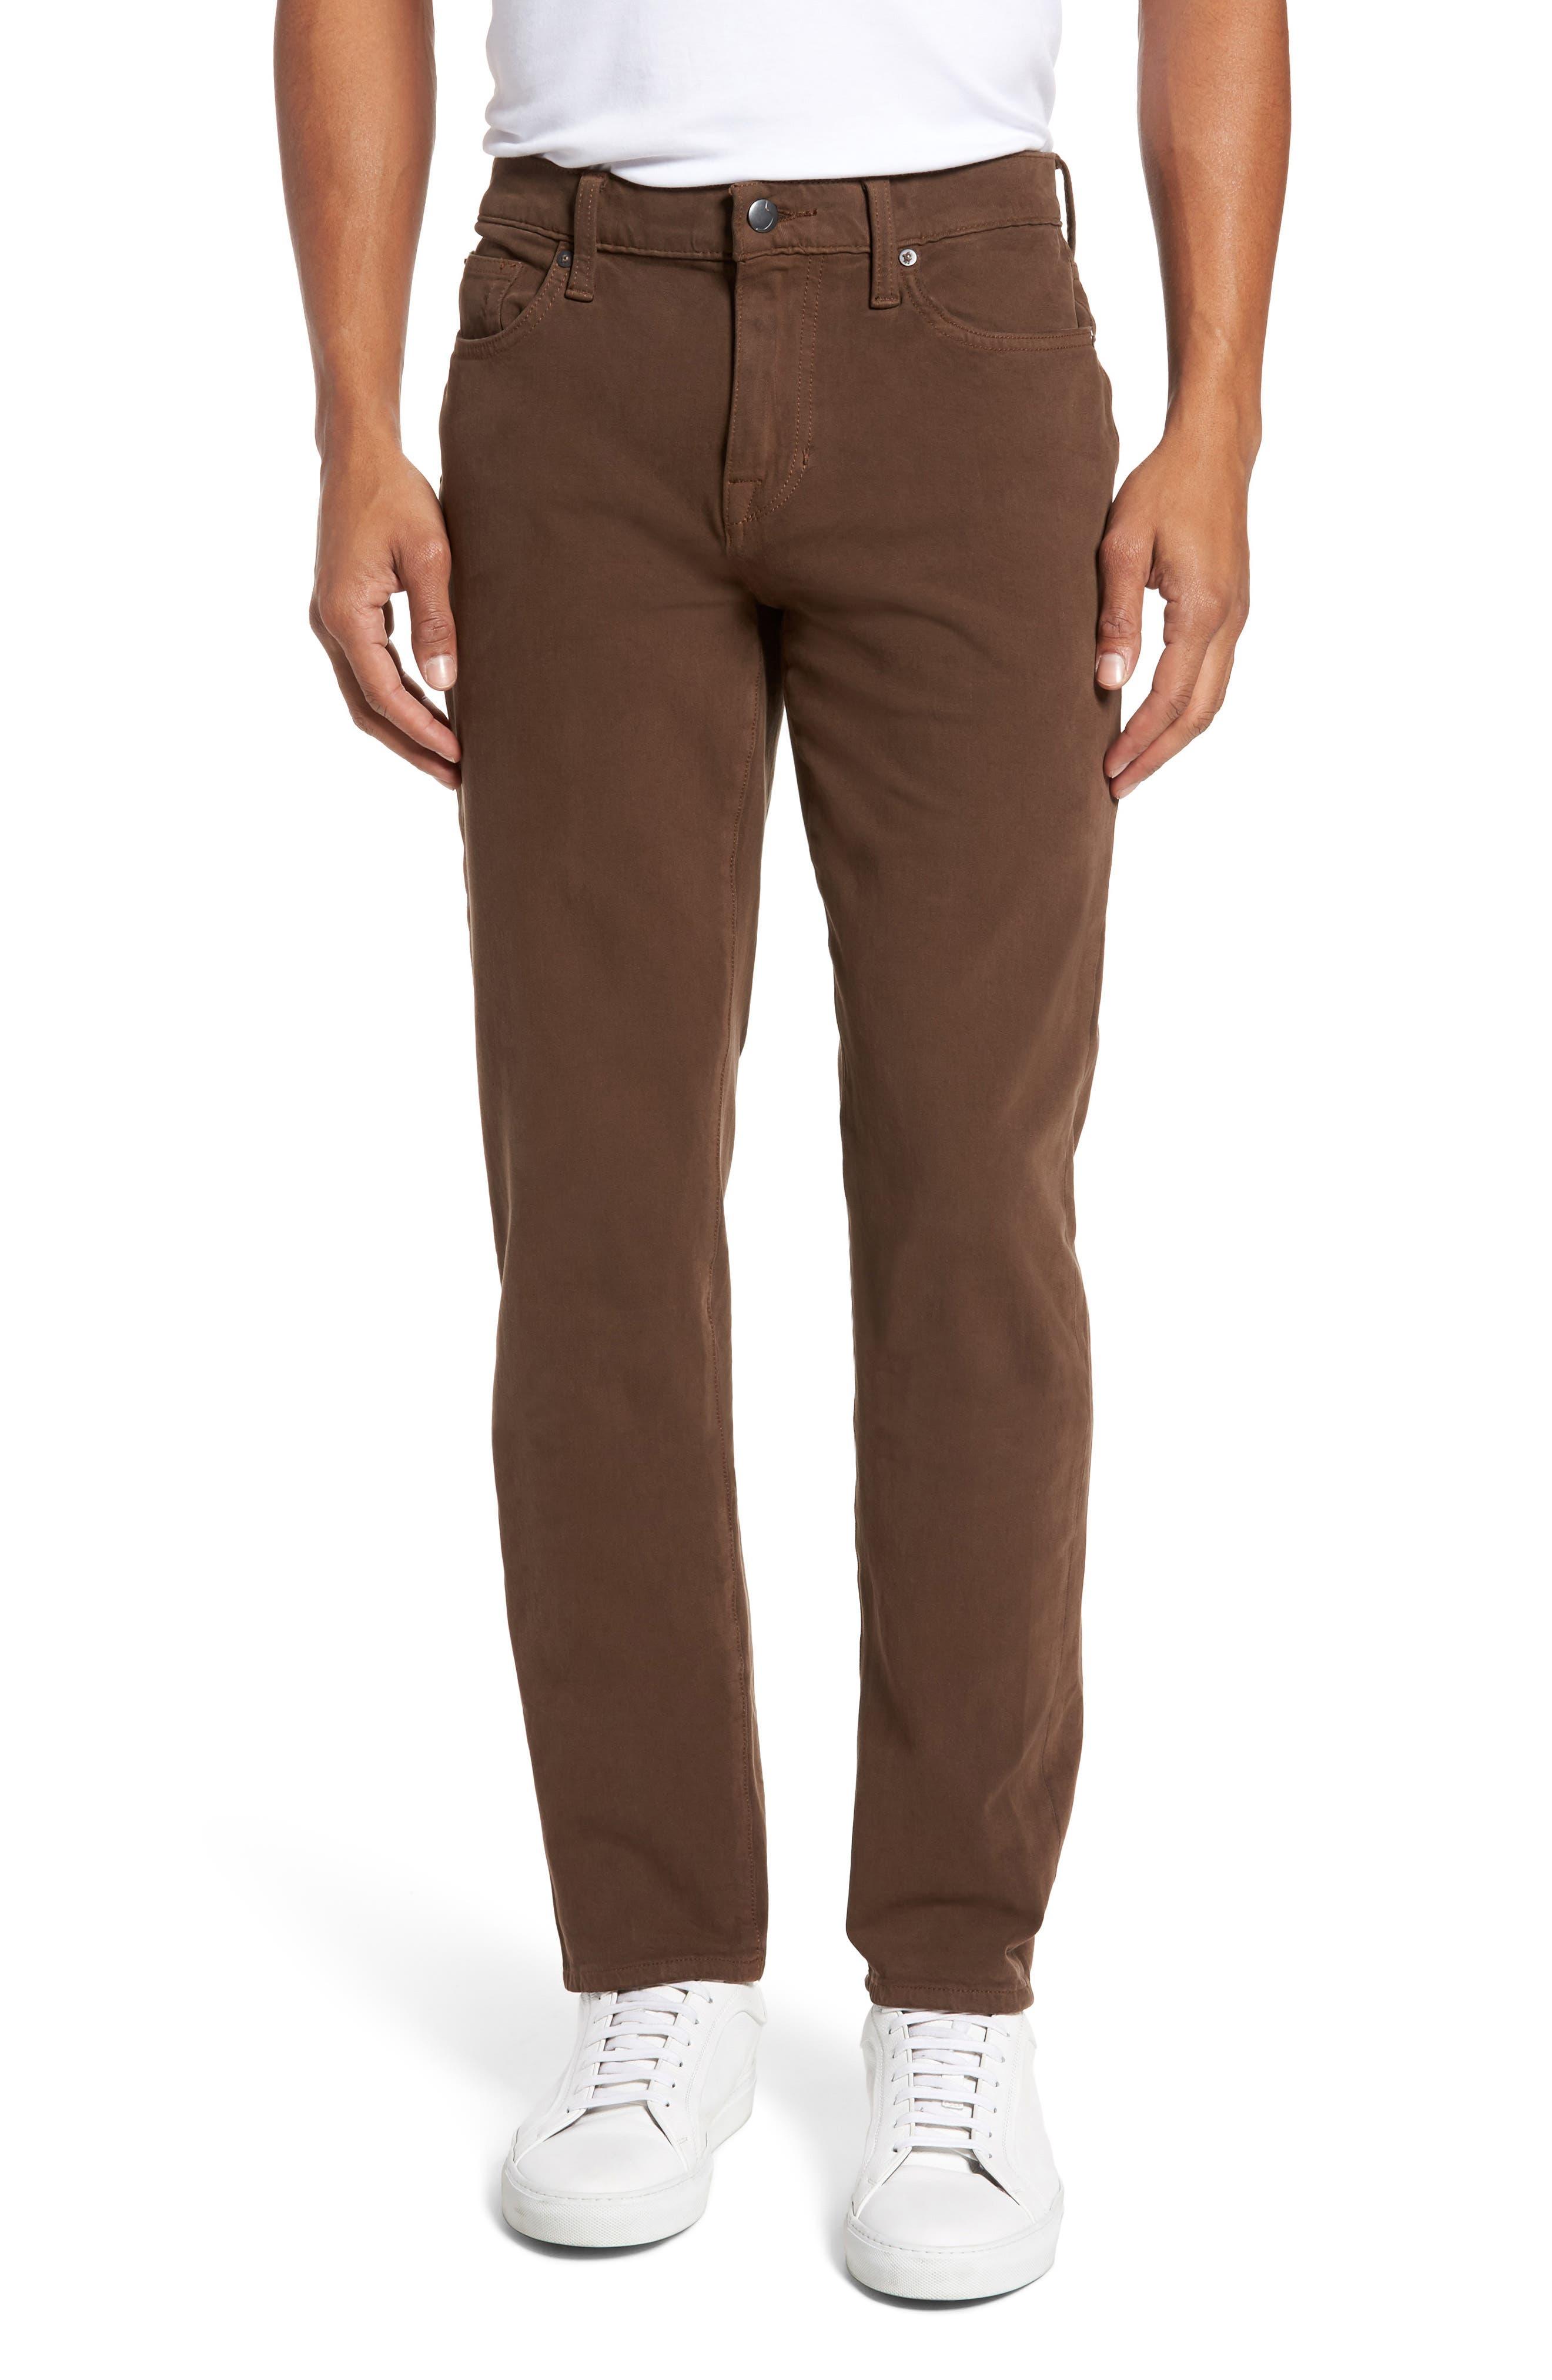 Alternate Image 1 Selected - Joe's Brixton Slim Straight Fit Jeans (Dark Walnut)